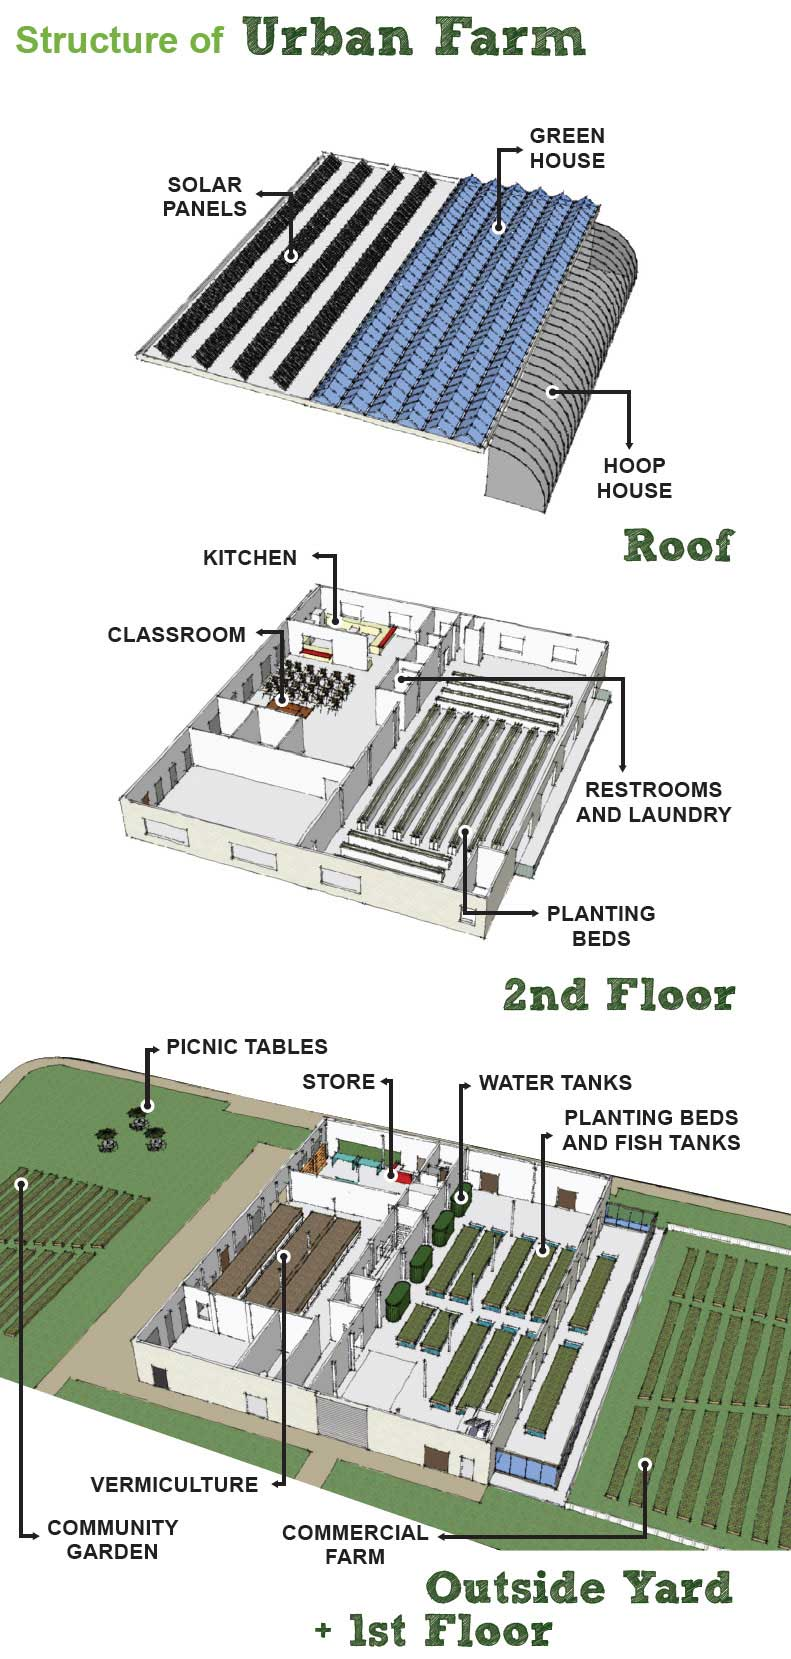 Vermiculture business plan